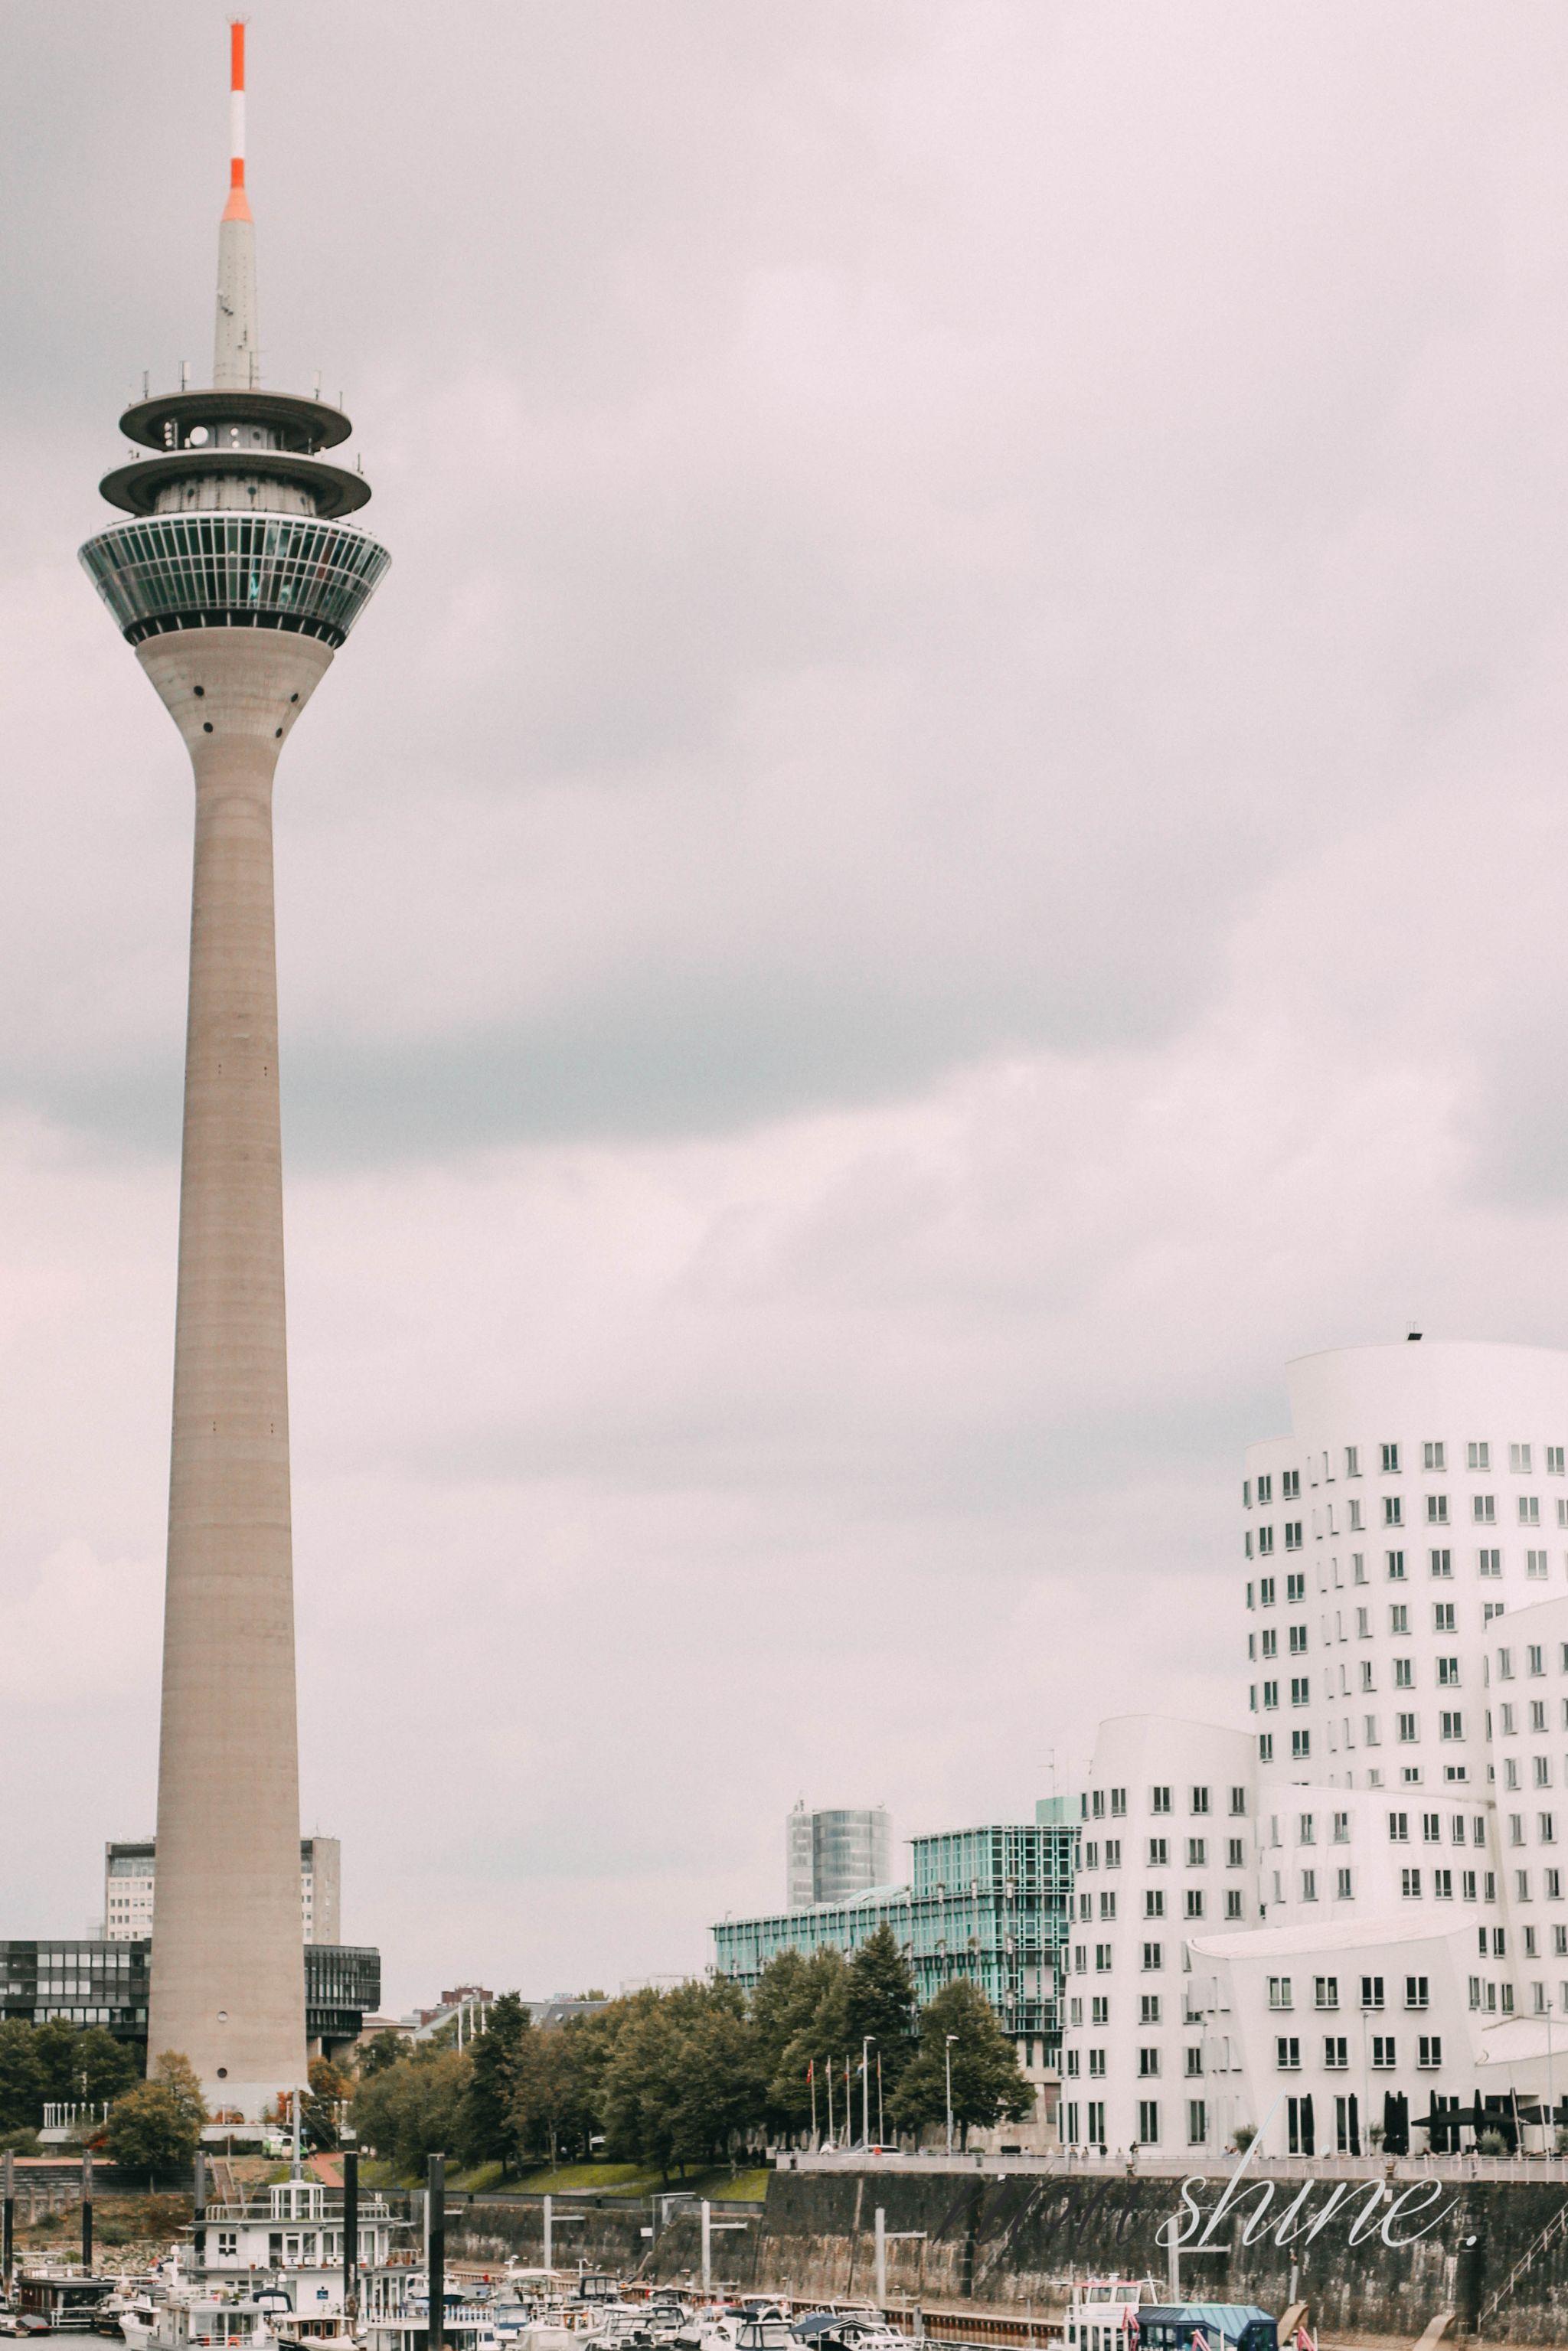 Defense Line von Paula´s Choice - Nowshine Beauty ü40 - my life, my city, my skin Kampagne - Medienhafen - Rheinturm Düsseldorf